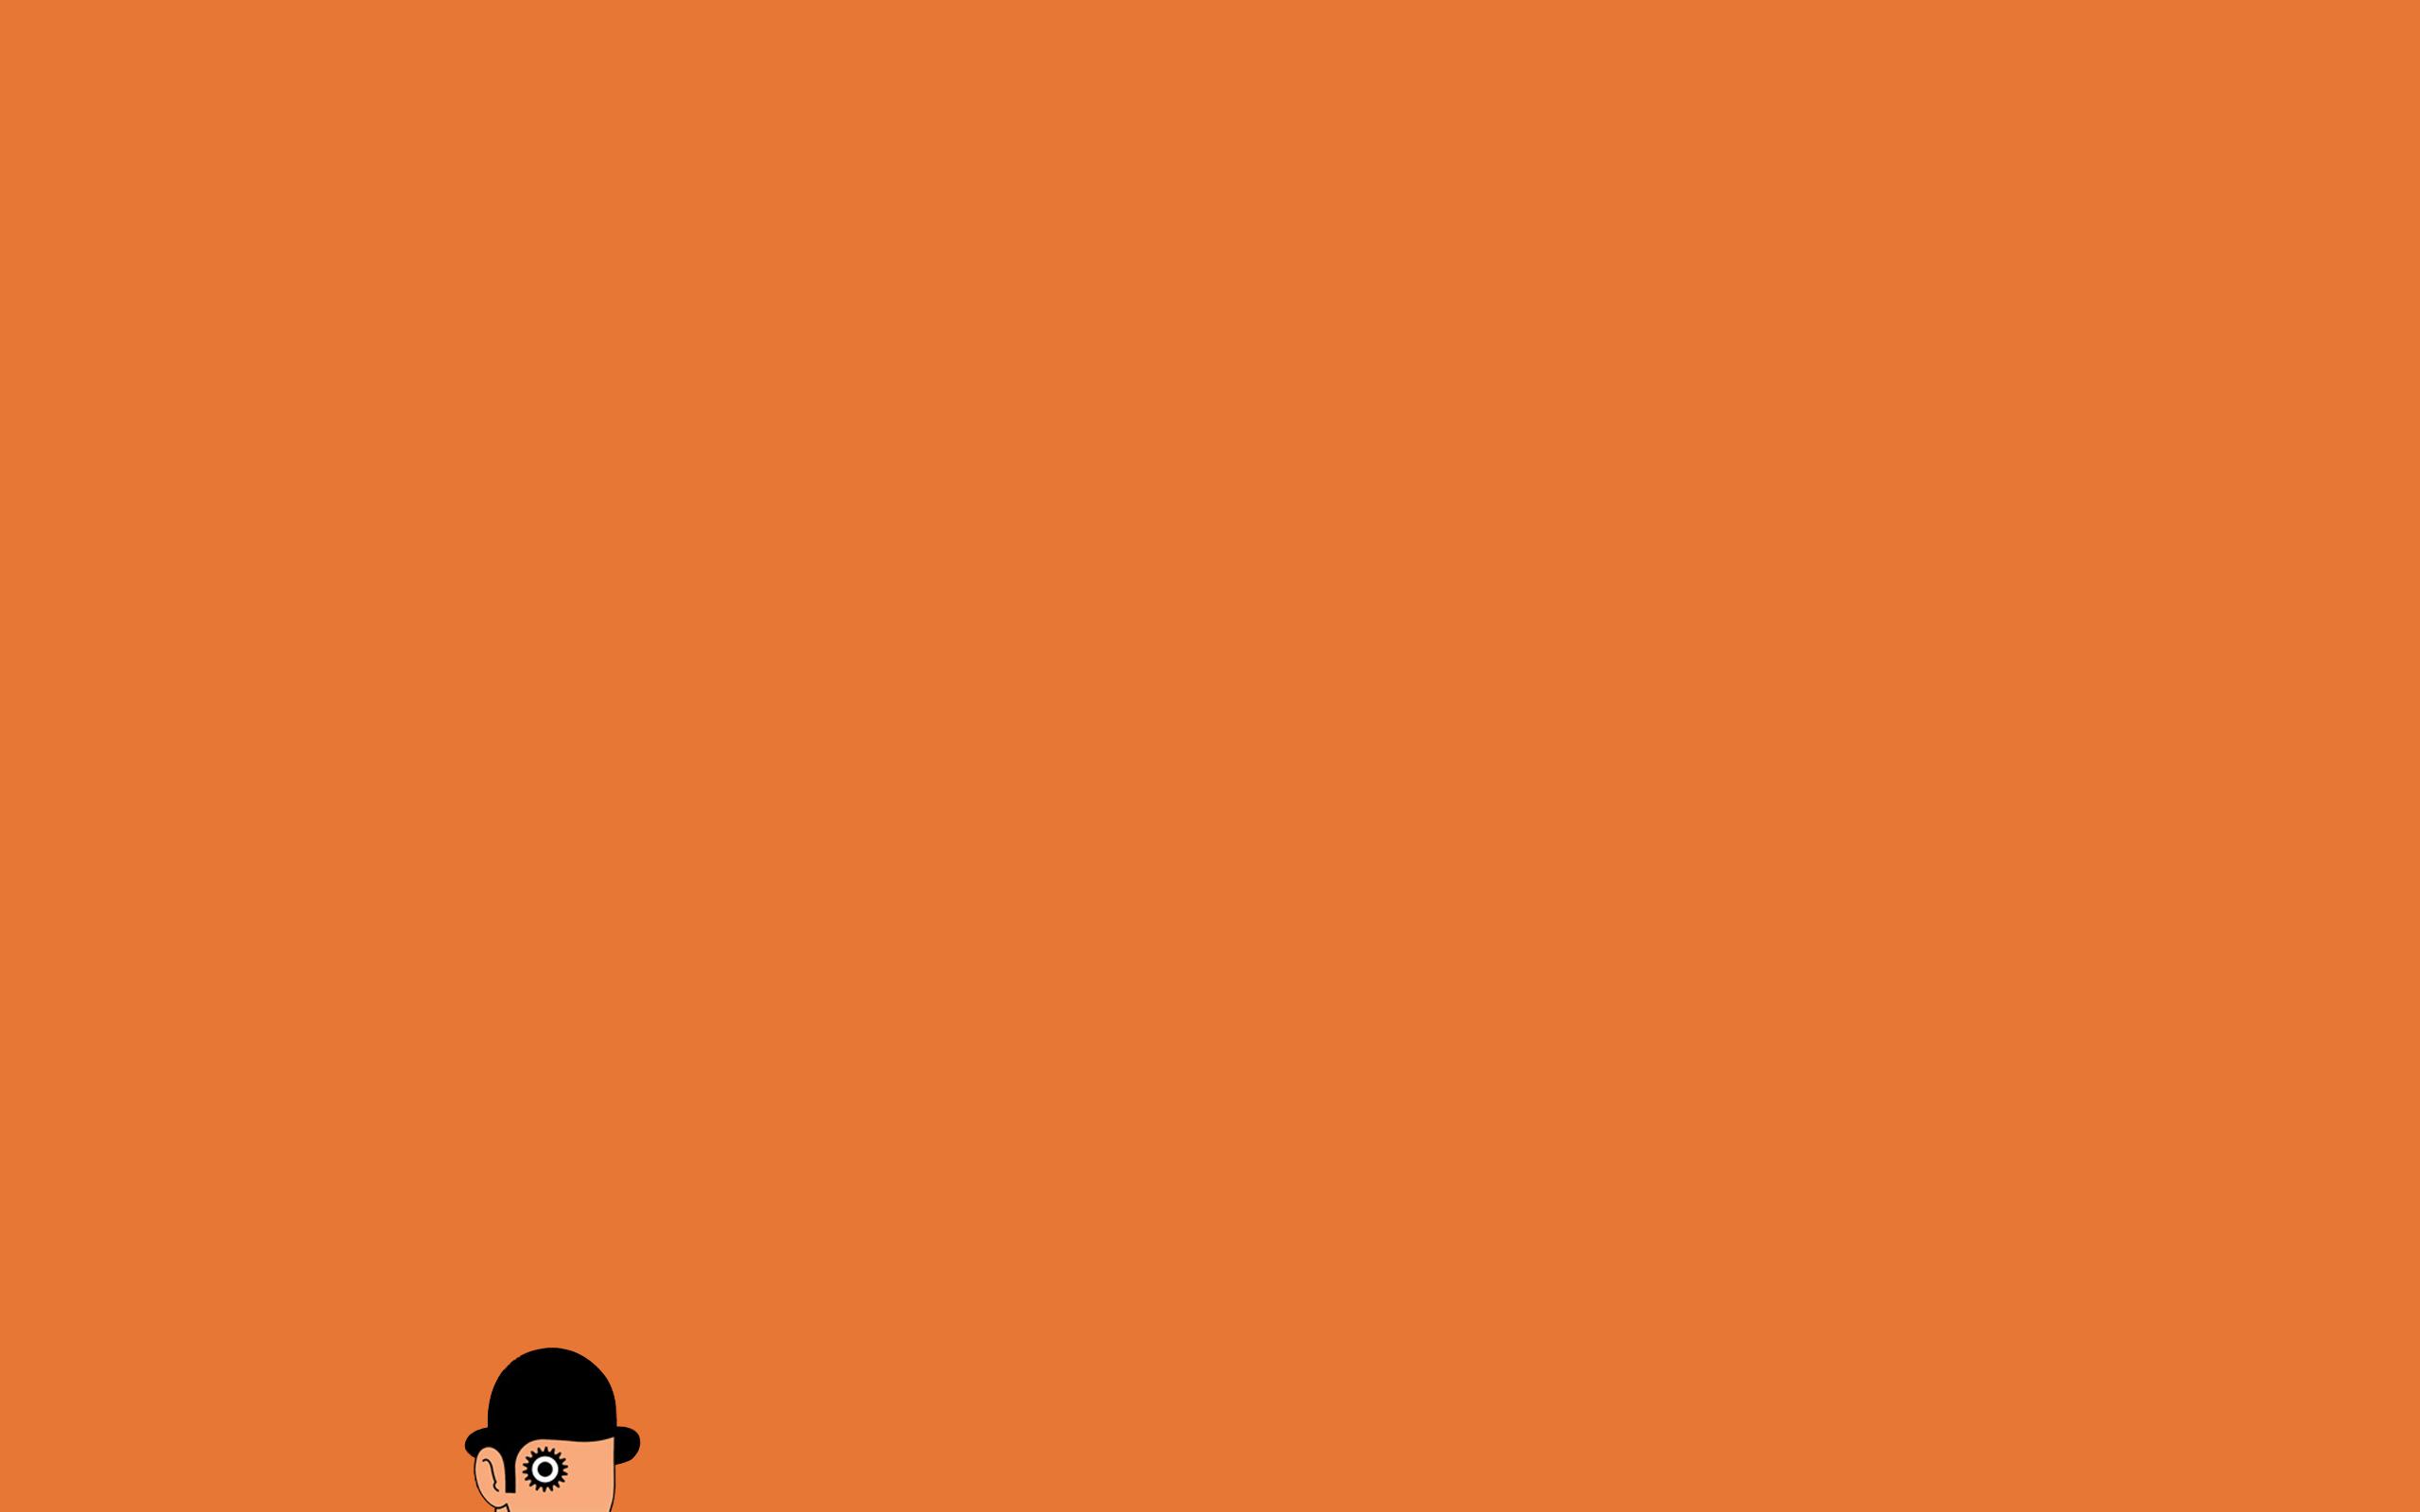 Clockwork Orange Wallpapers High Quality